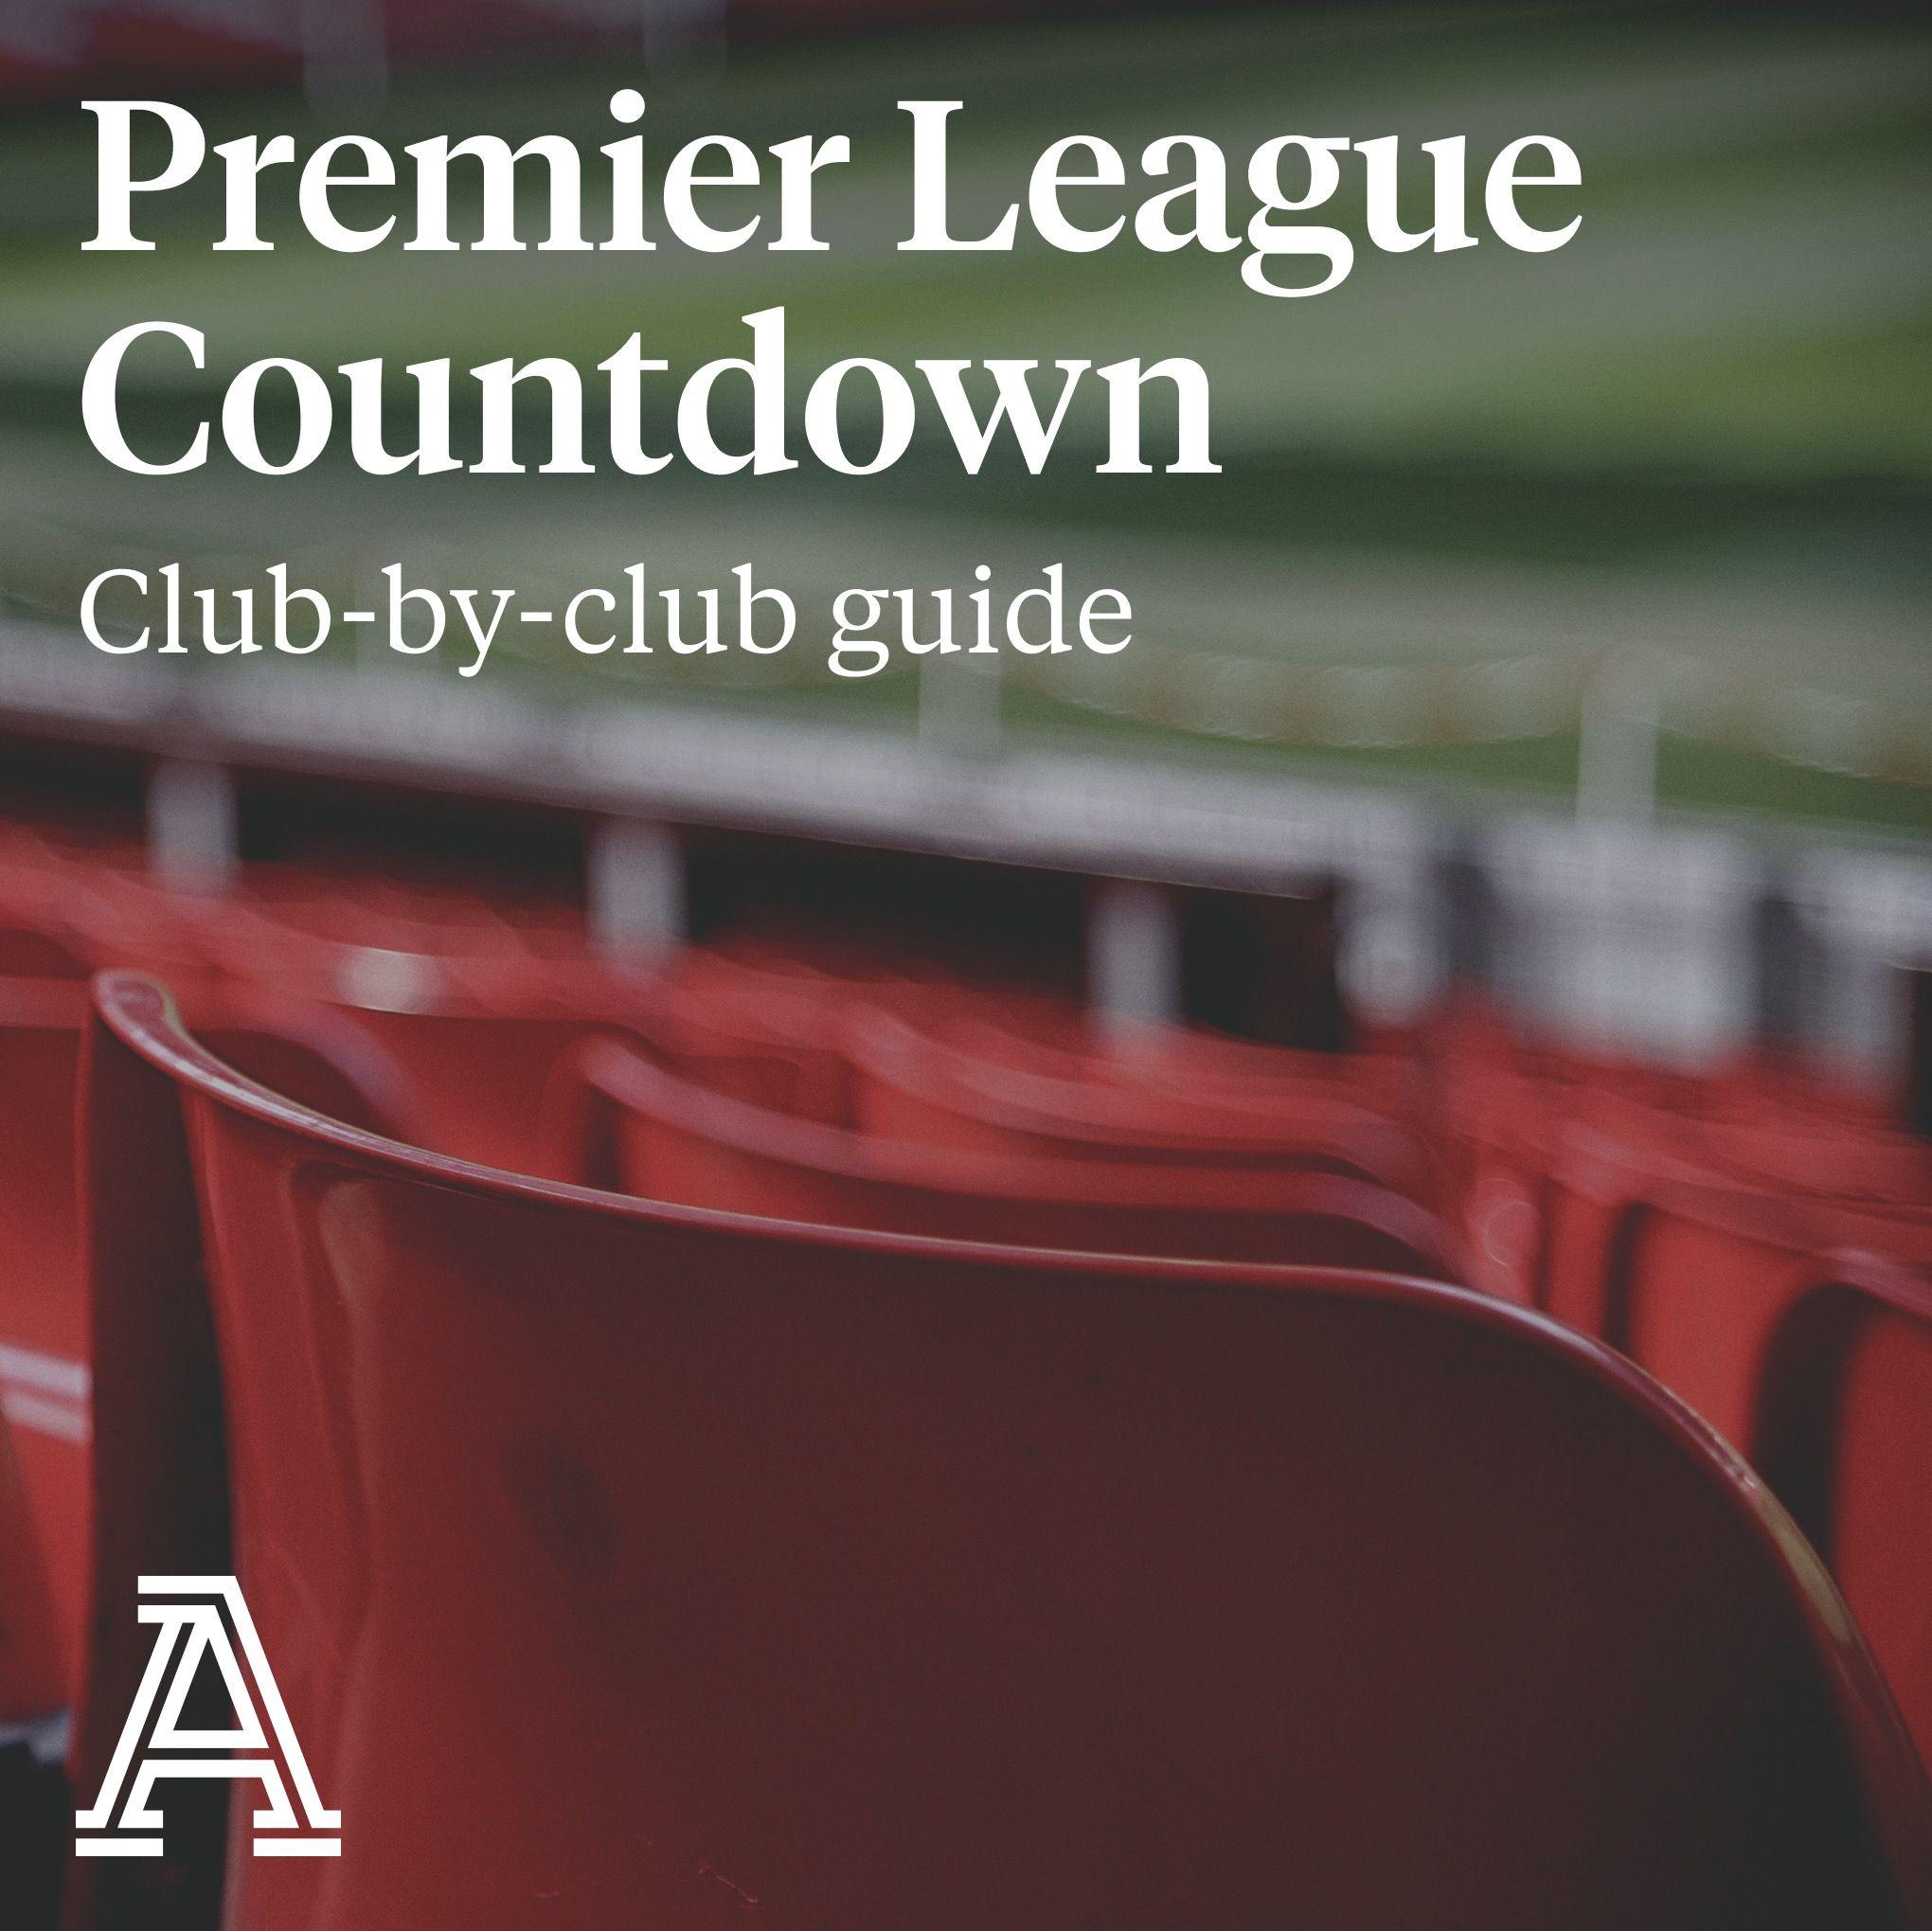 Premier League Countdown - Arsenal